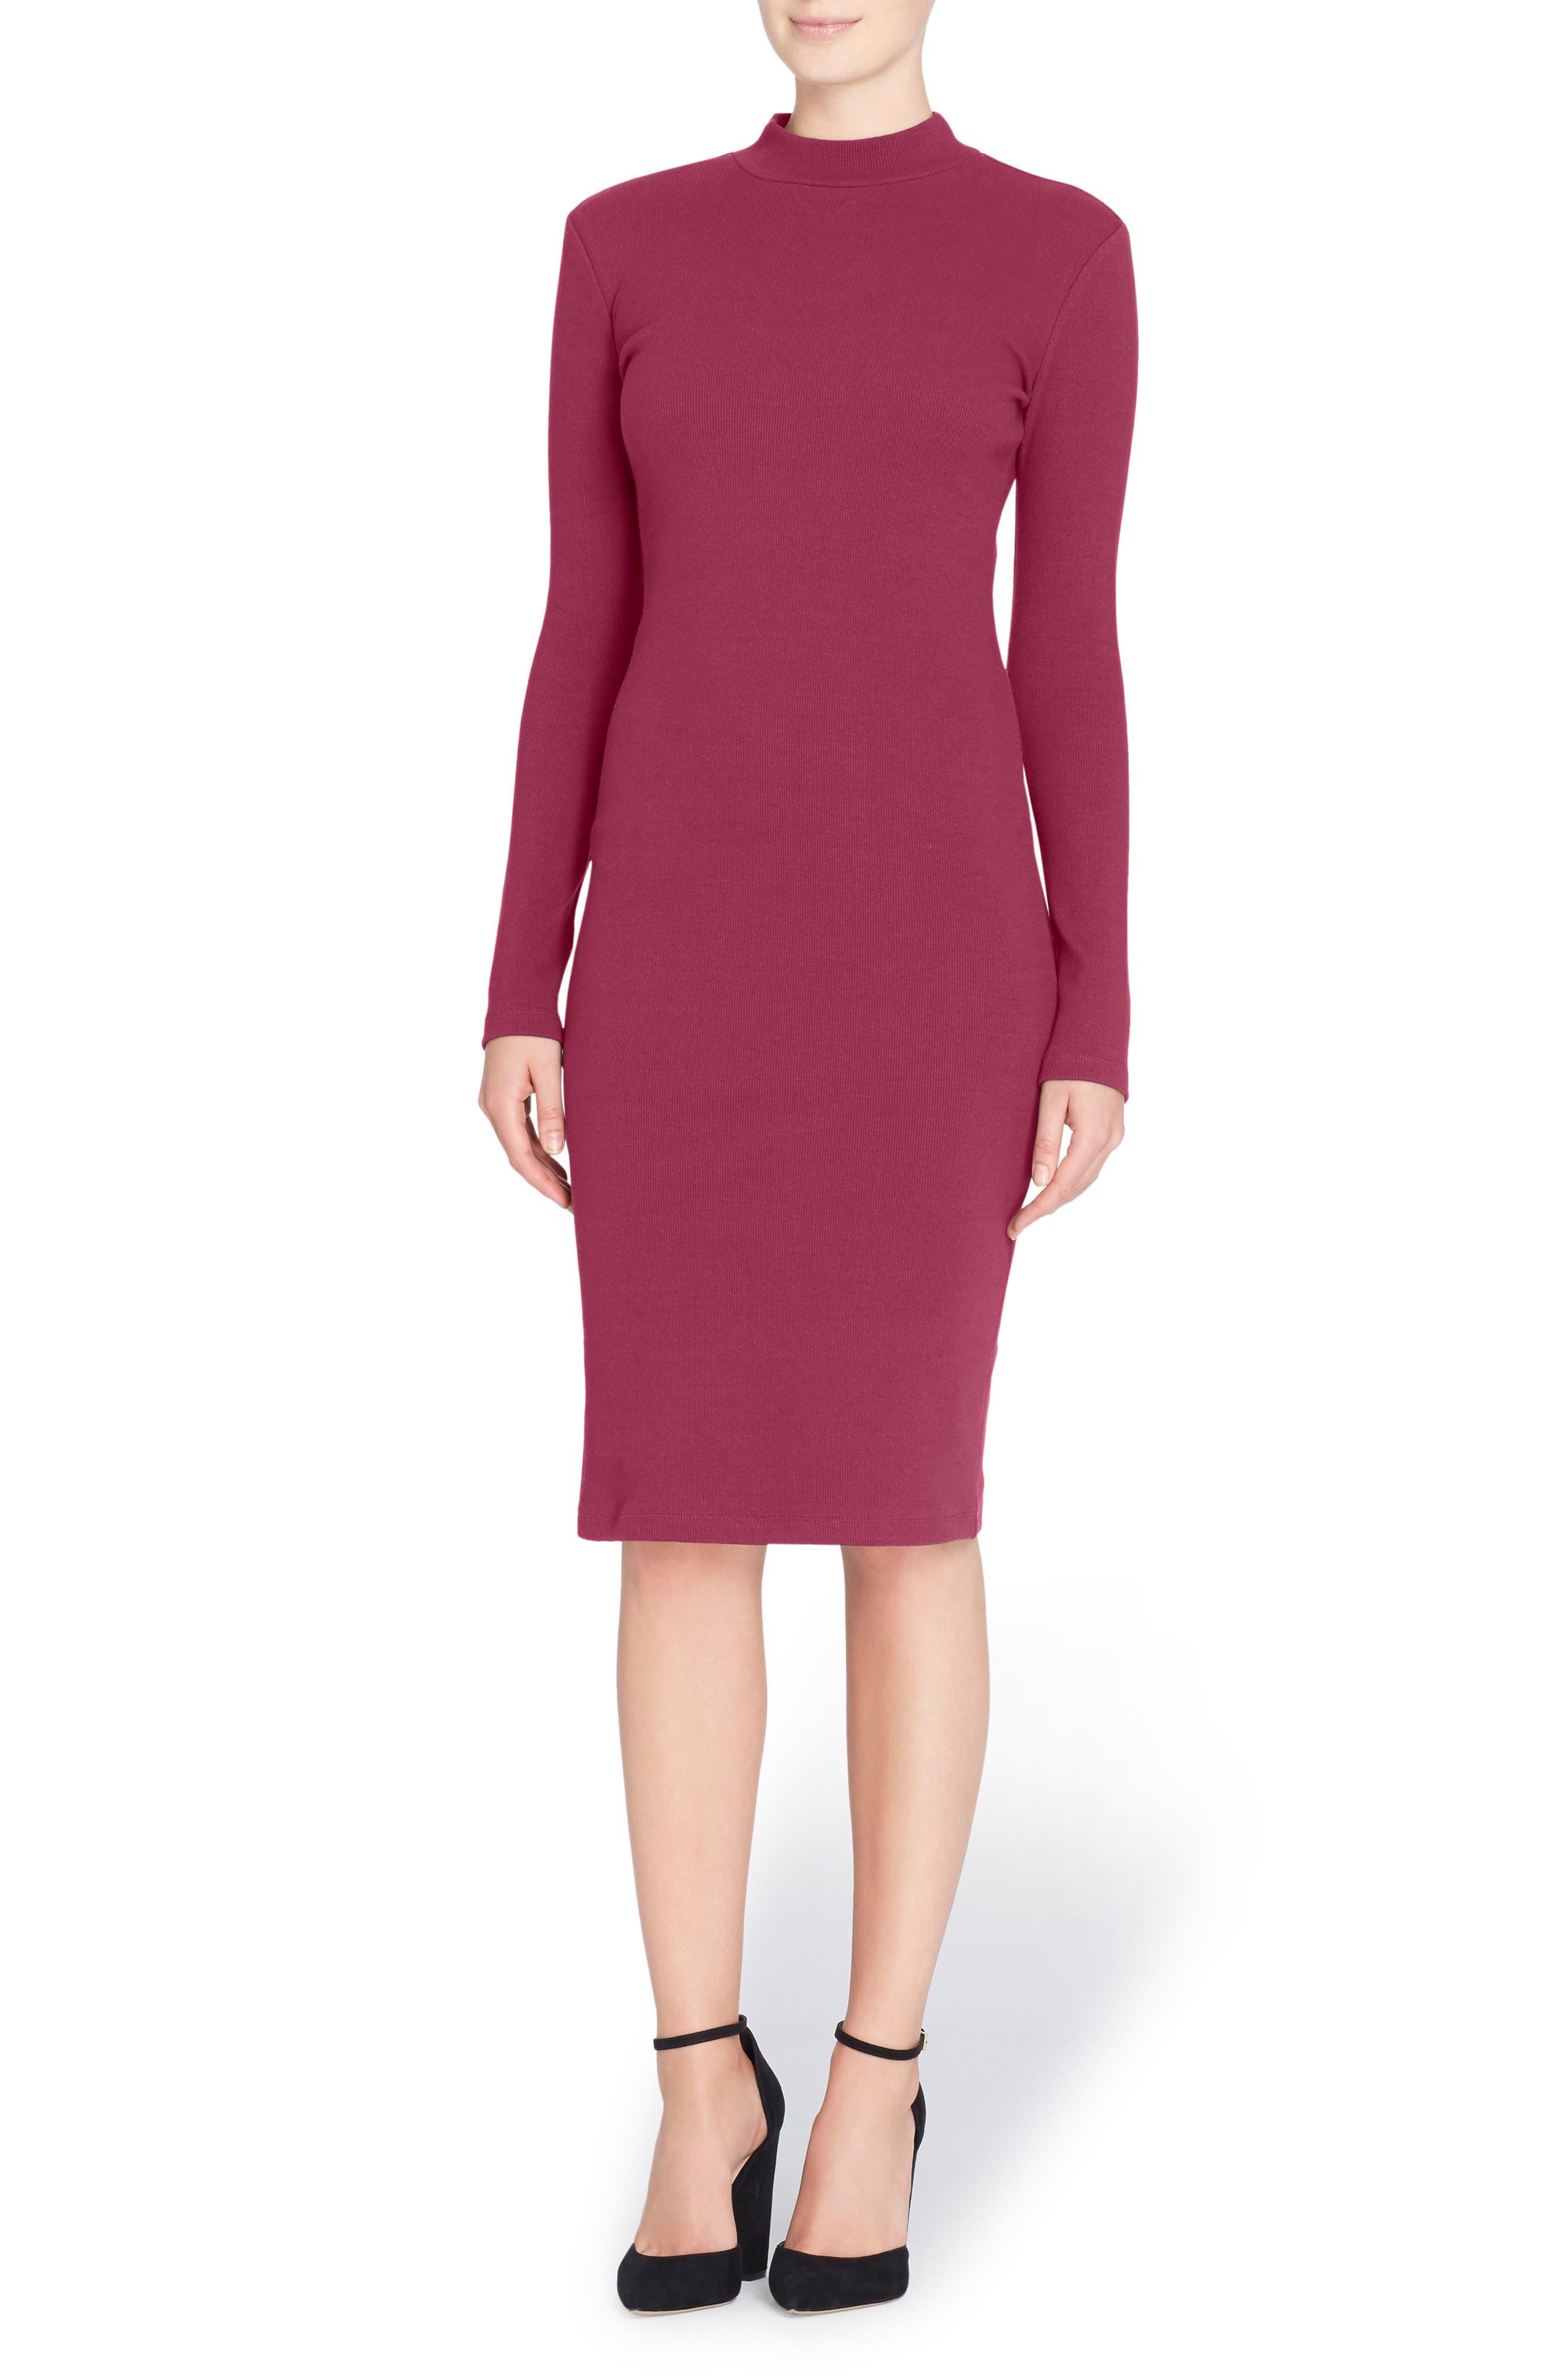 'Kristiana' Knit Midi Dress,                         Main,                         color, Grape Wine